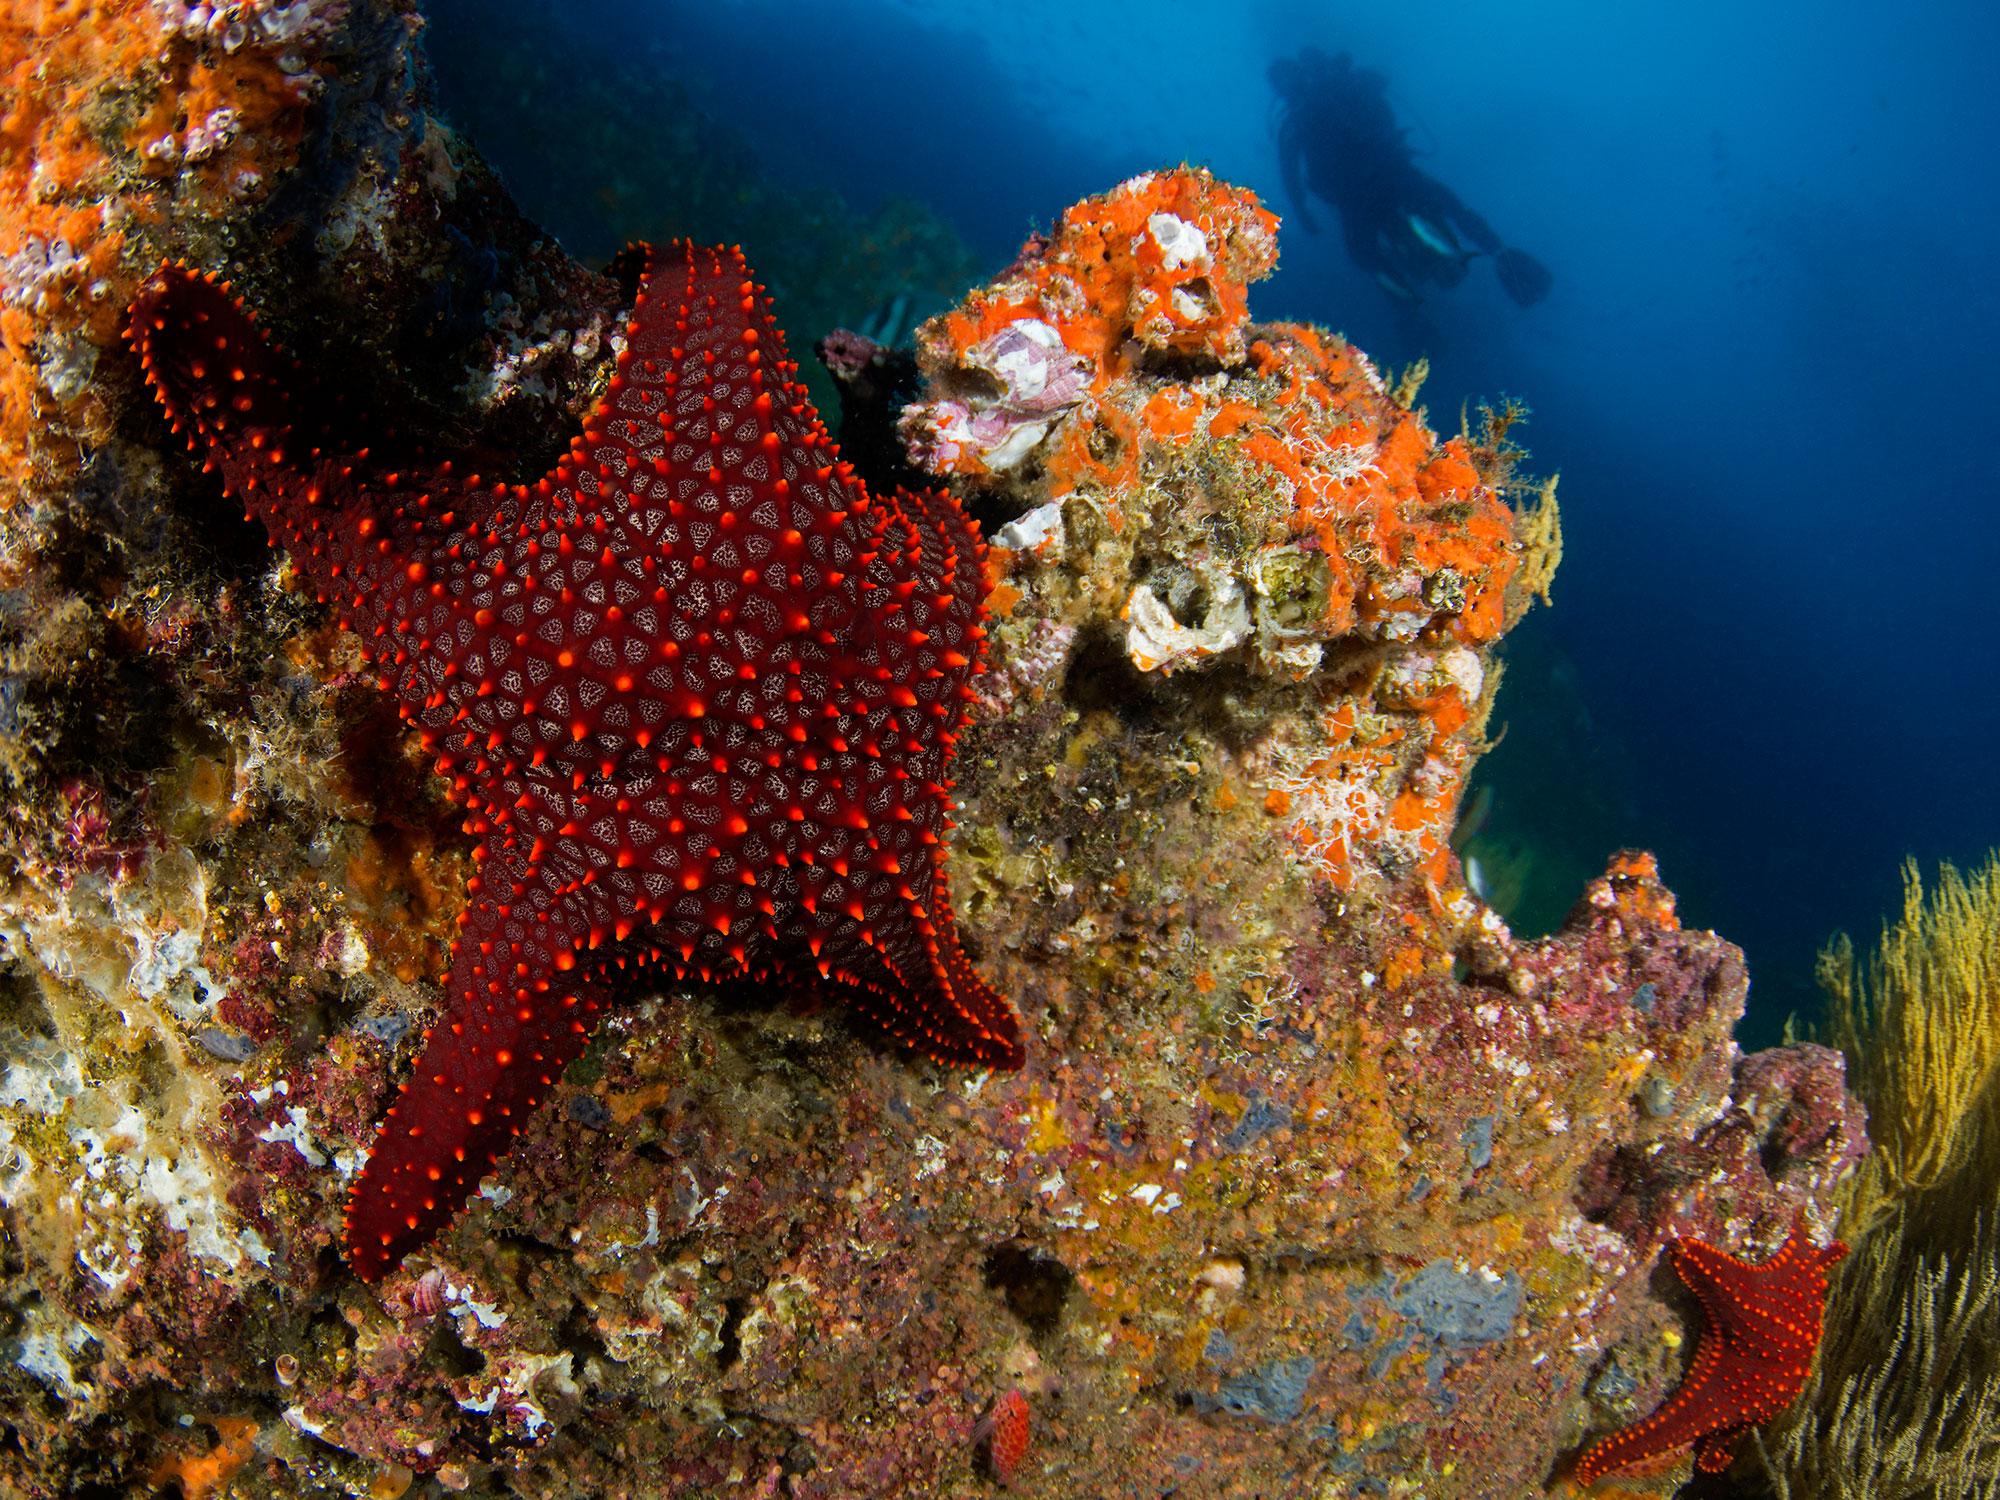 Galapagos Sea Star, Seestern